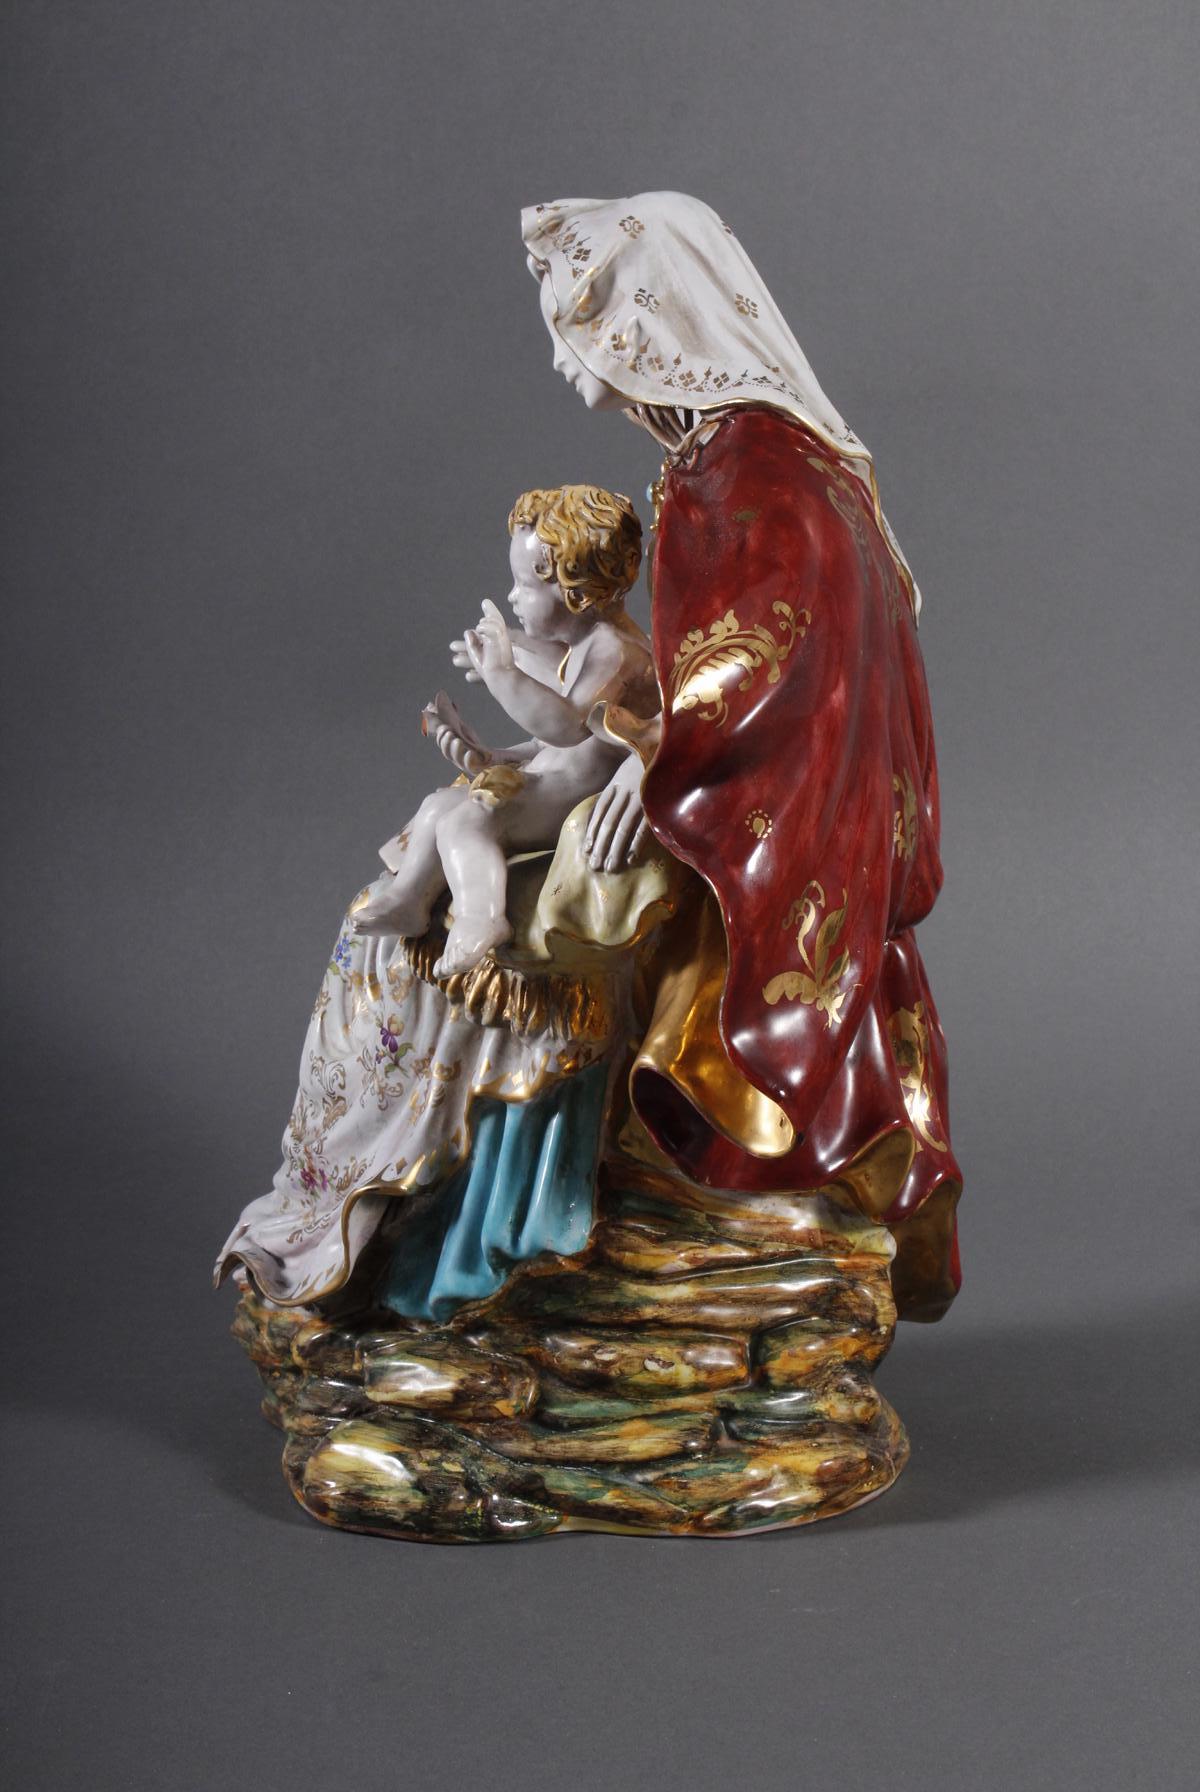 Keramik-Skulptur Madonna mit Kind, wohl Italien 2. Hälfte 20. Jh.-5